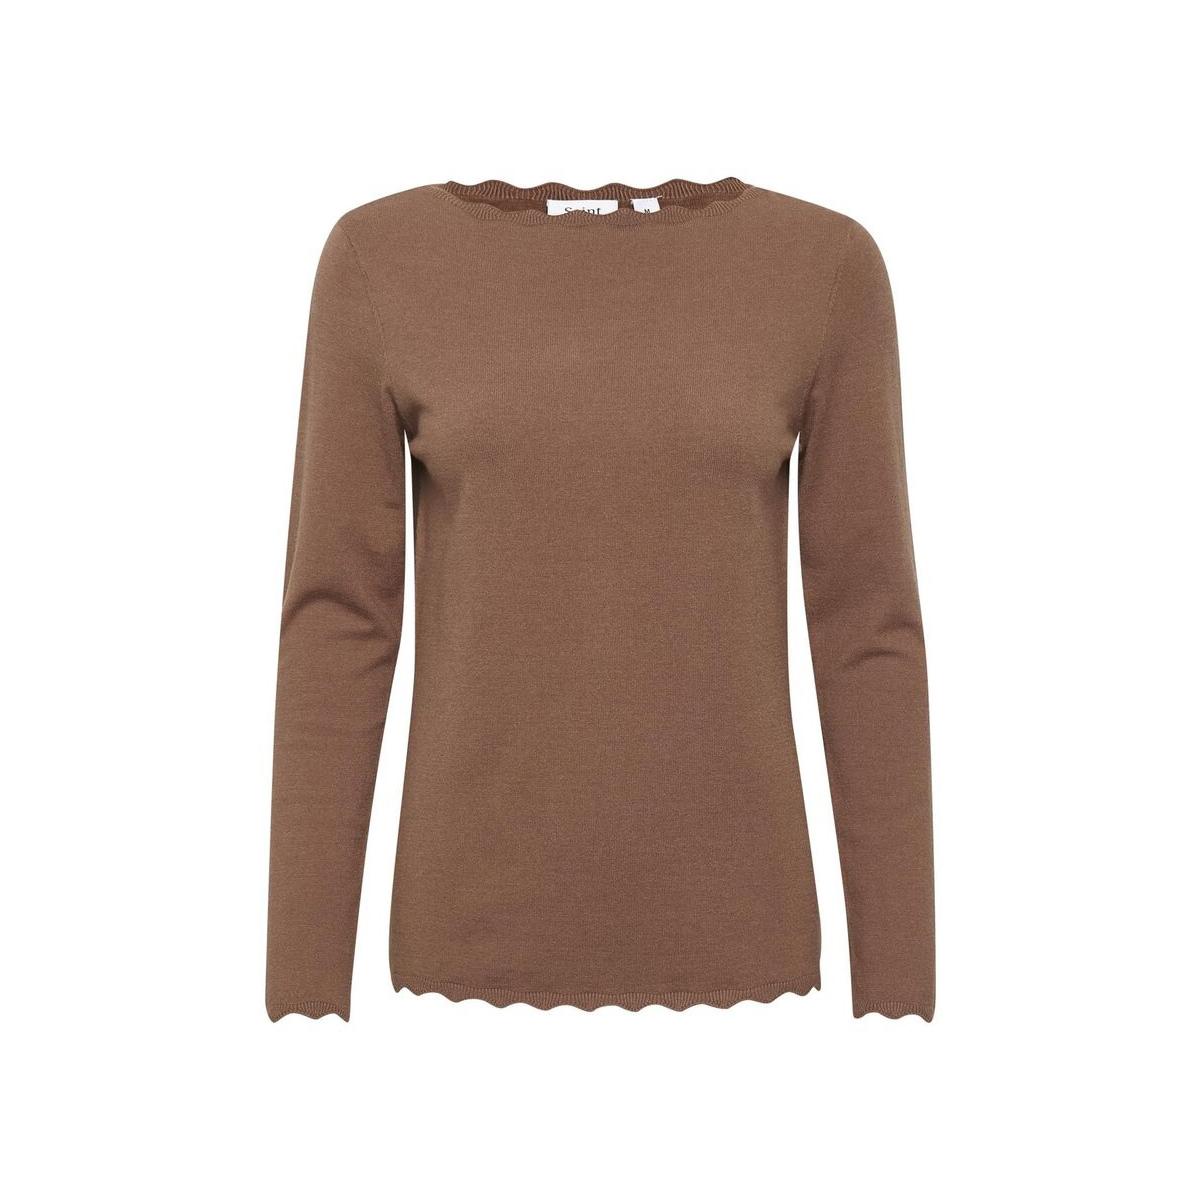 knitted blouse ls u2522 30501521 saint tropez trui 181030 thrush